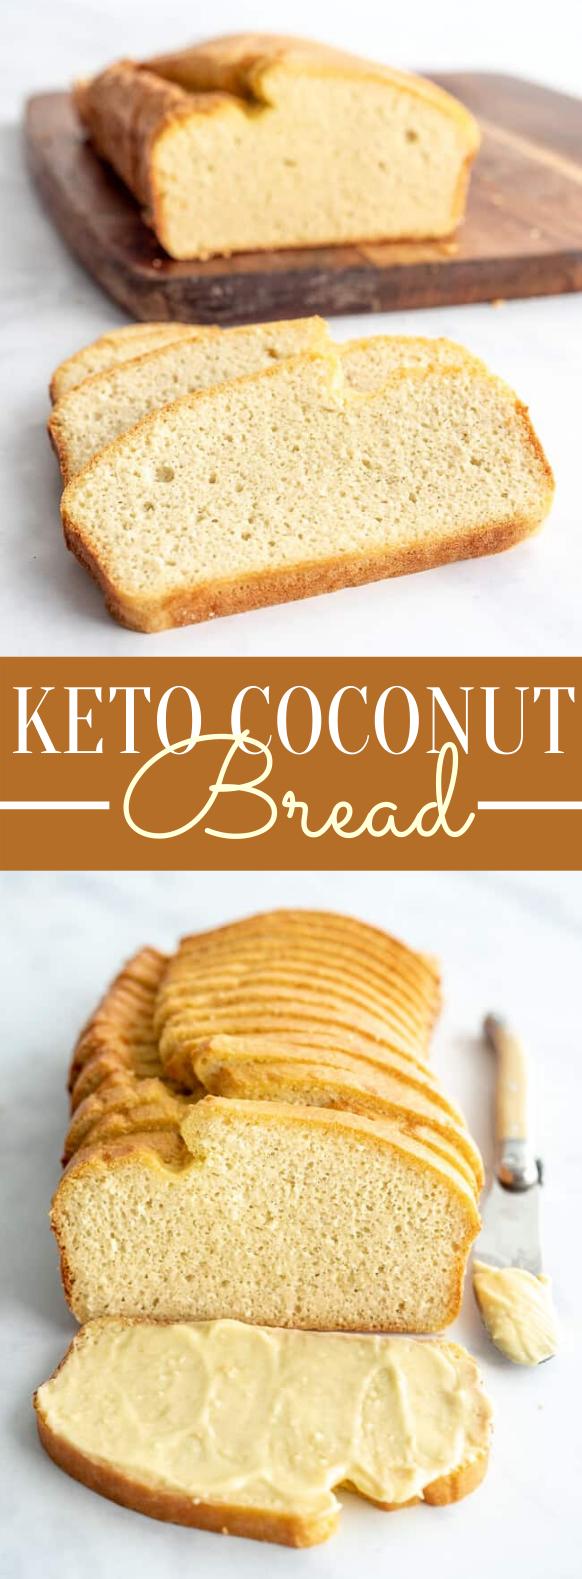 KETO COCONUT BREAD #nutfree #glutenfree